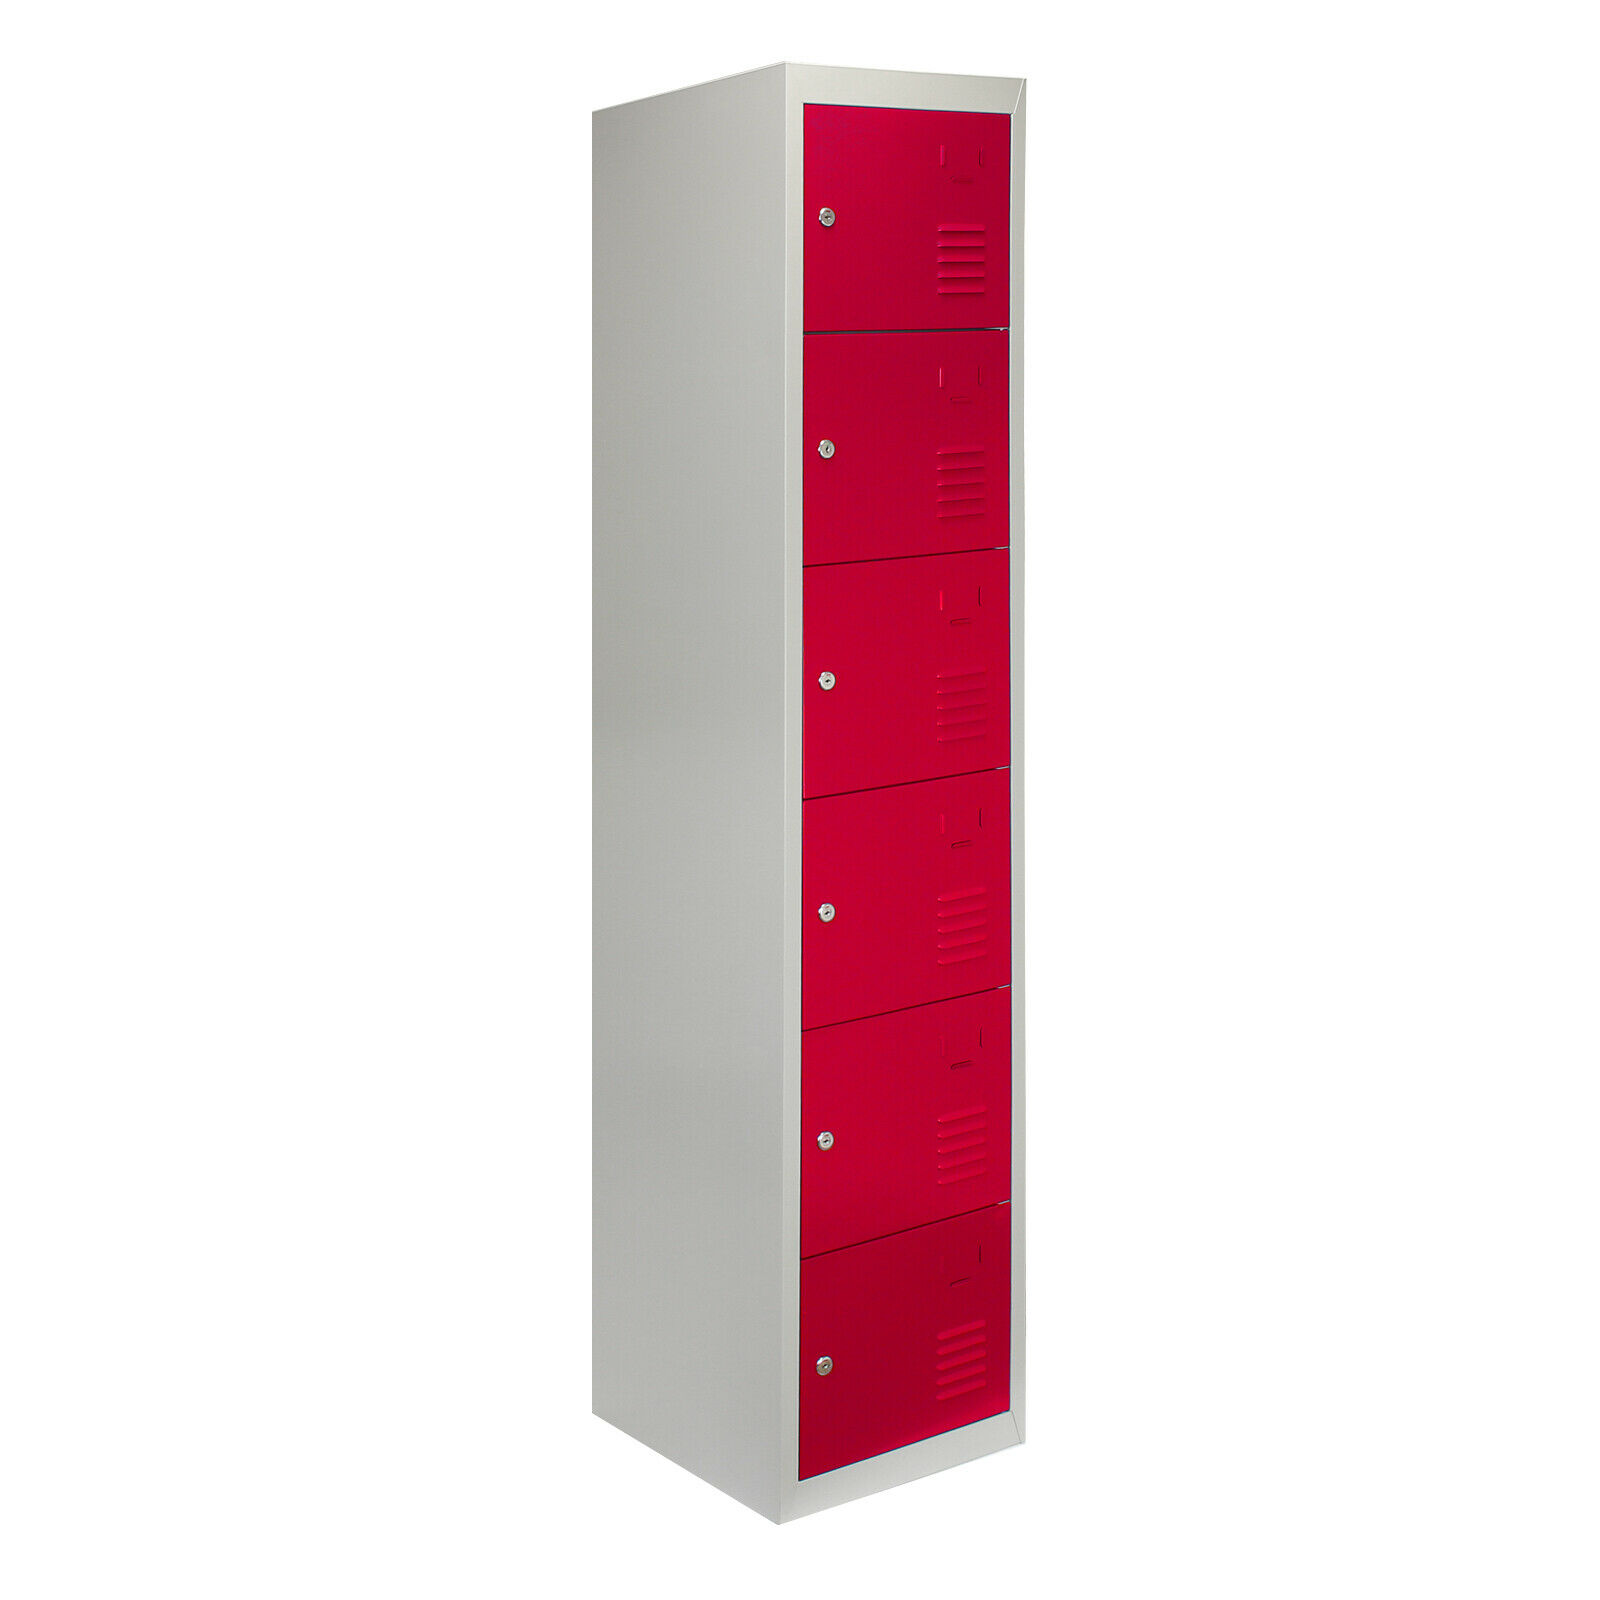 Locker Metal Steel Storage Lockers Gym 6 Door Changing Room School Lockable Red